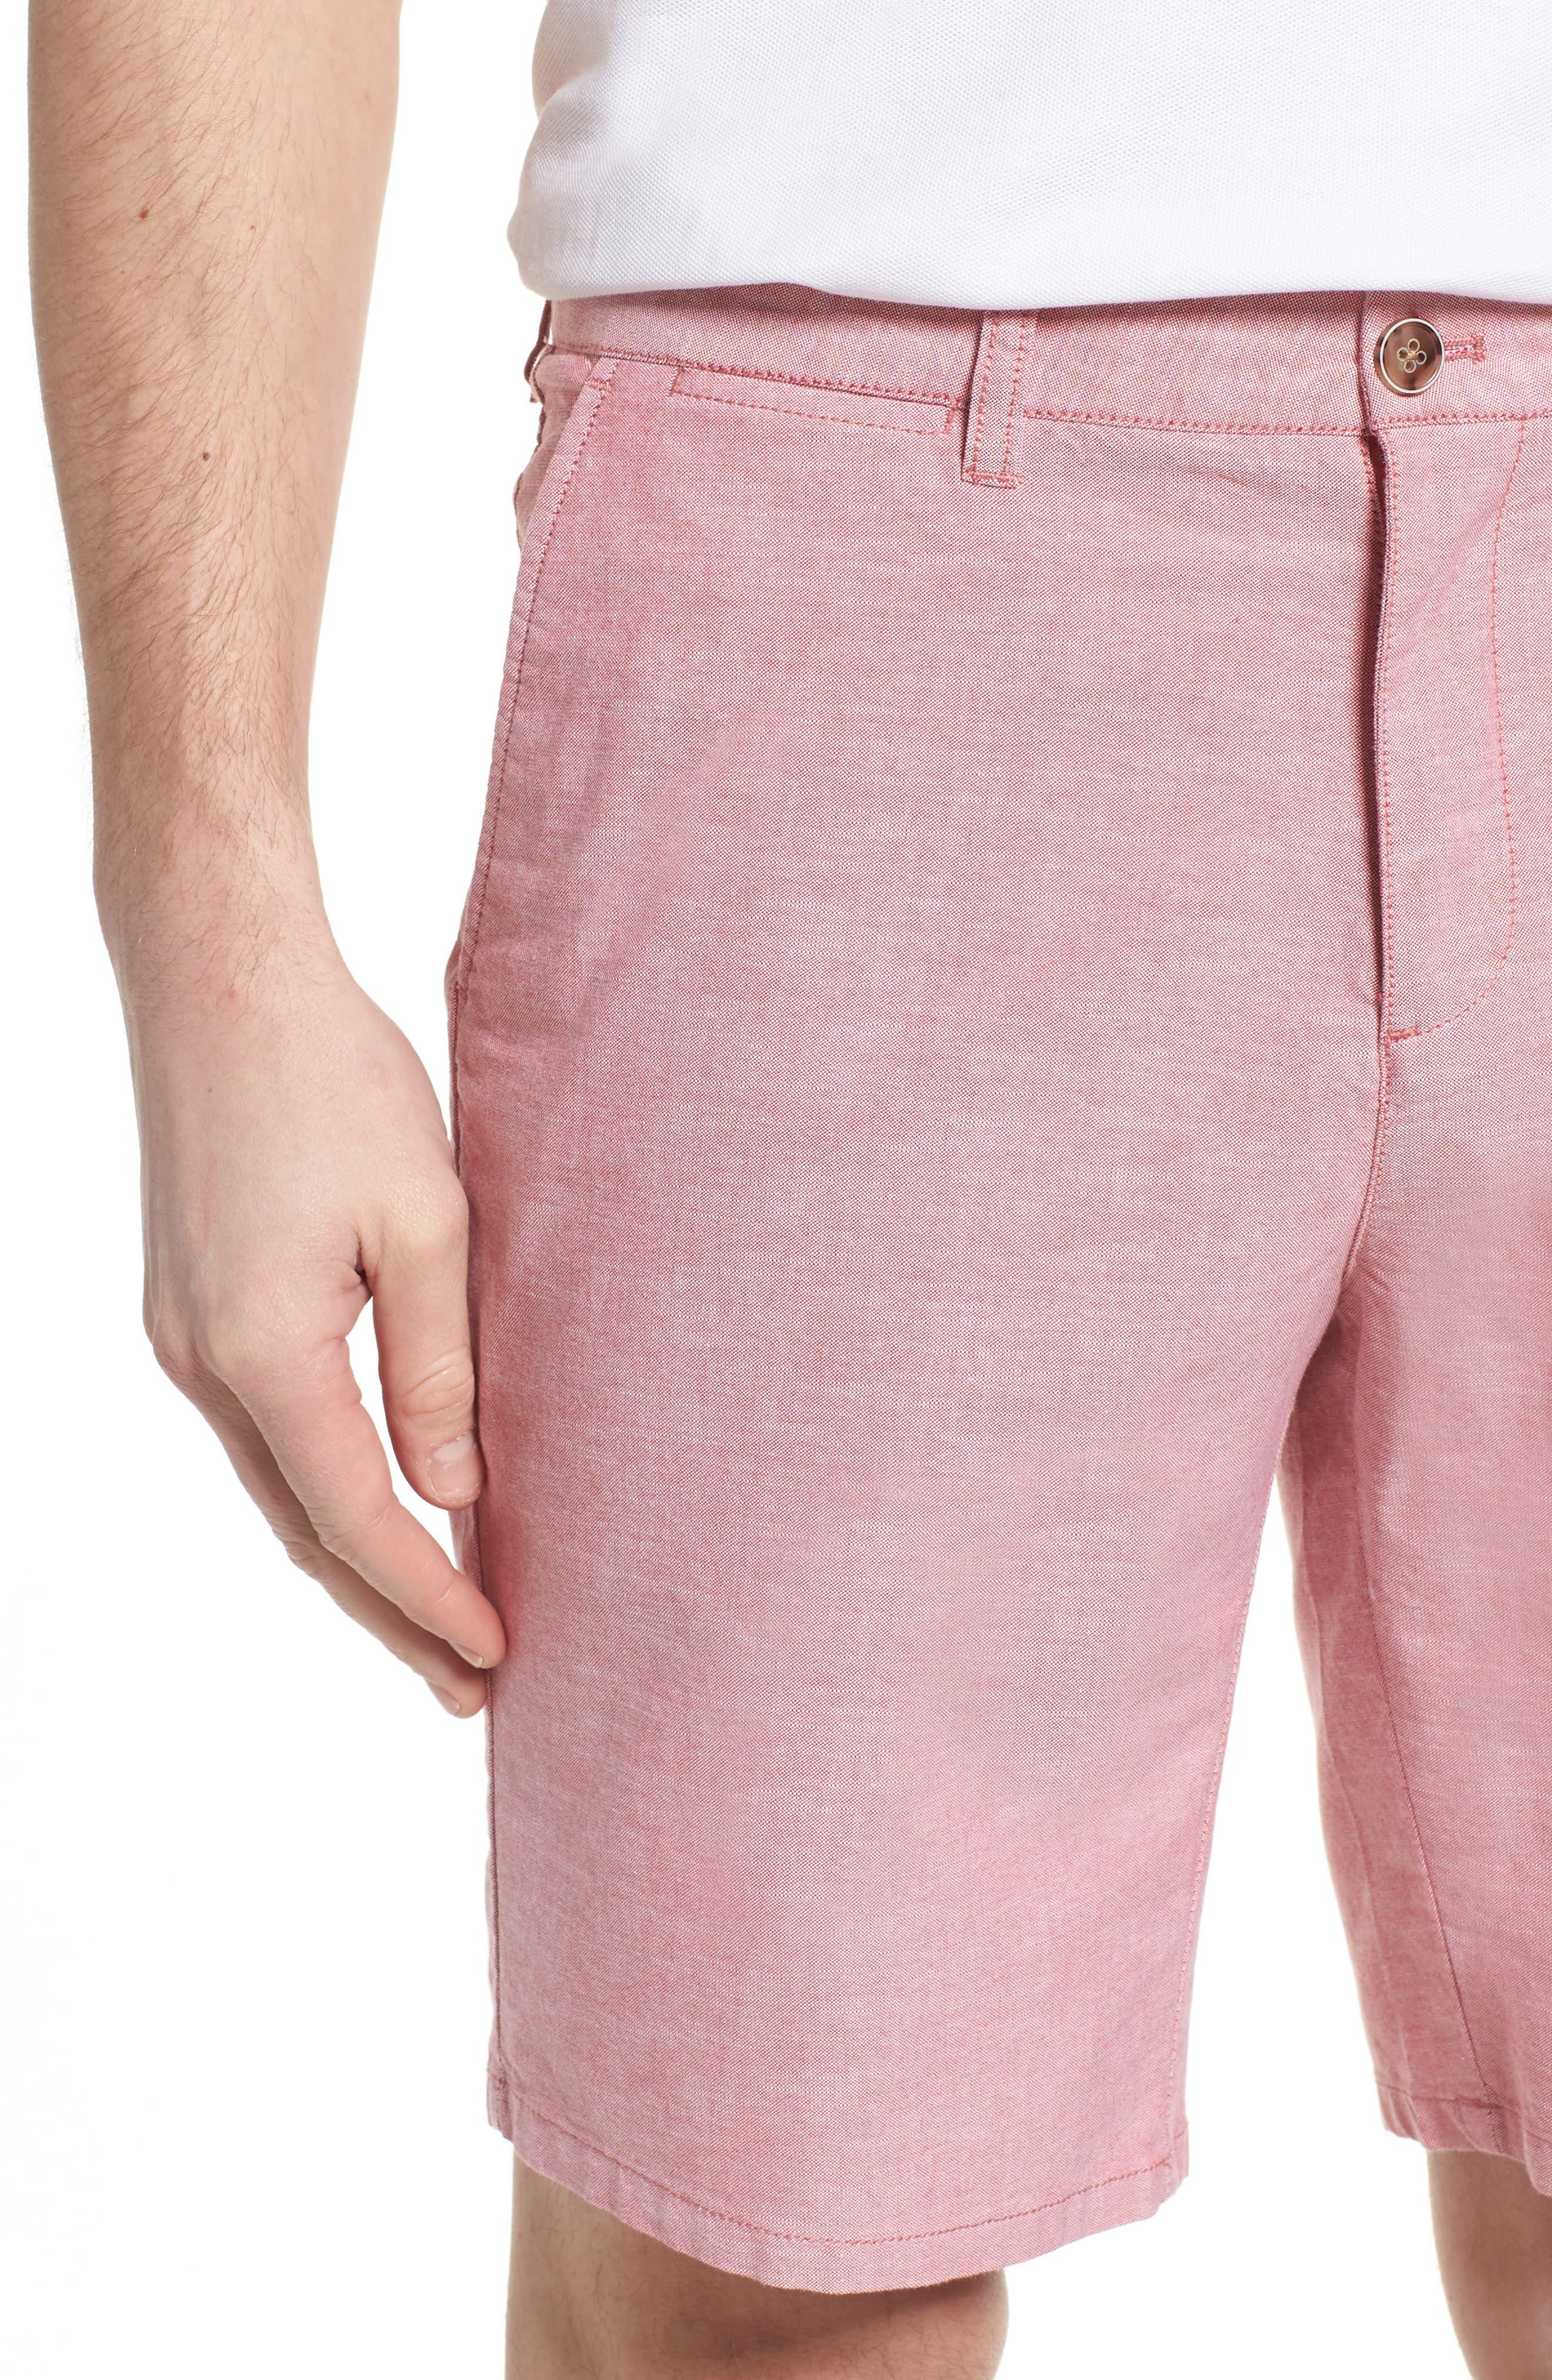 Merritt Regular Fit Shorts,                             Alternate thumbnail 4, color,                             Malibu Red